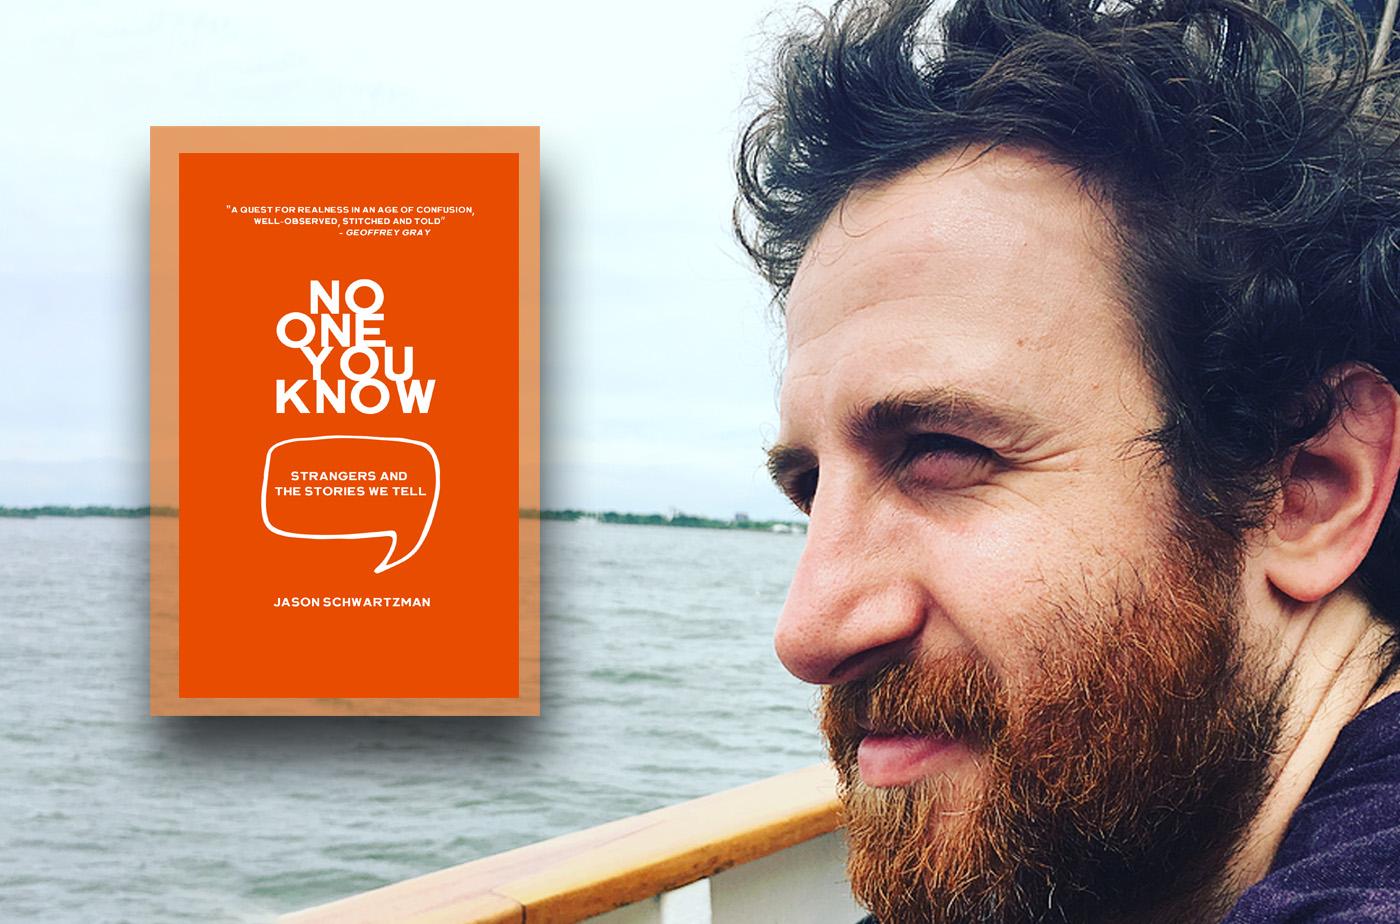 Catapult online classes: Jason  Schwartzman, 4-Week Online Nonfiction Seminar: The Art of Flash Nonfiction, Nonfiction, Seminar